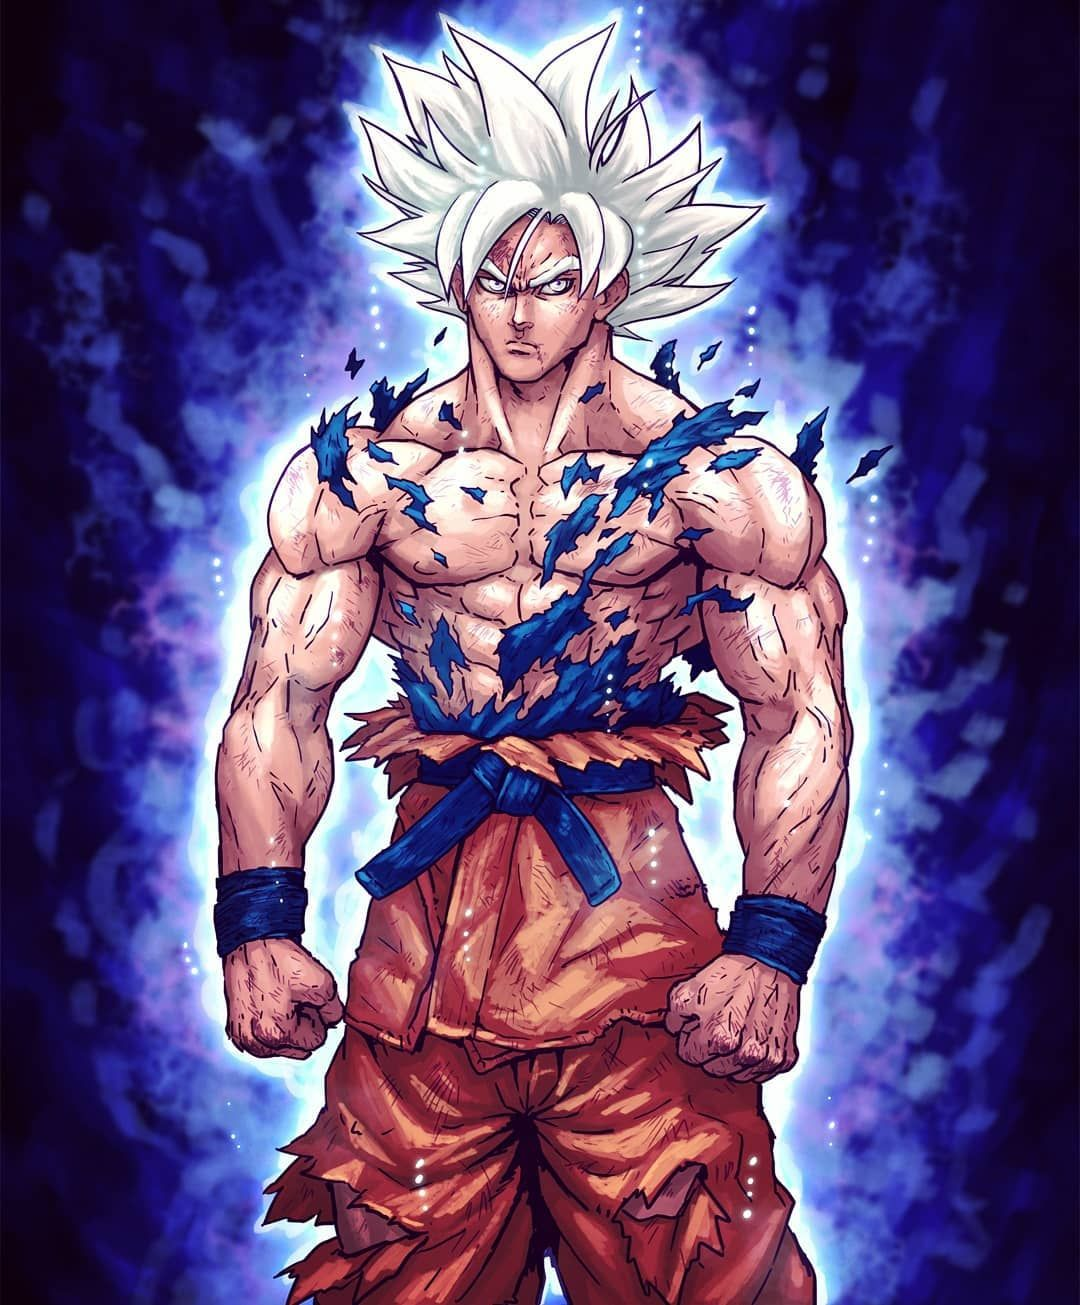 Mastered Ultra Instinct Son Goku Hey Guys I Finally Got Myself To Finish This Hope Dragon Ball Super Goku Dragon Ball Super Manga Anime Dragon Ball Super